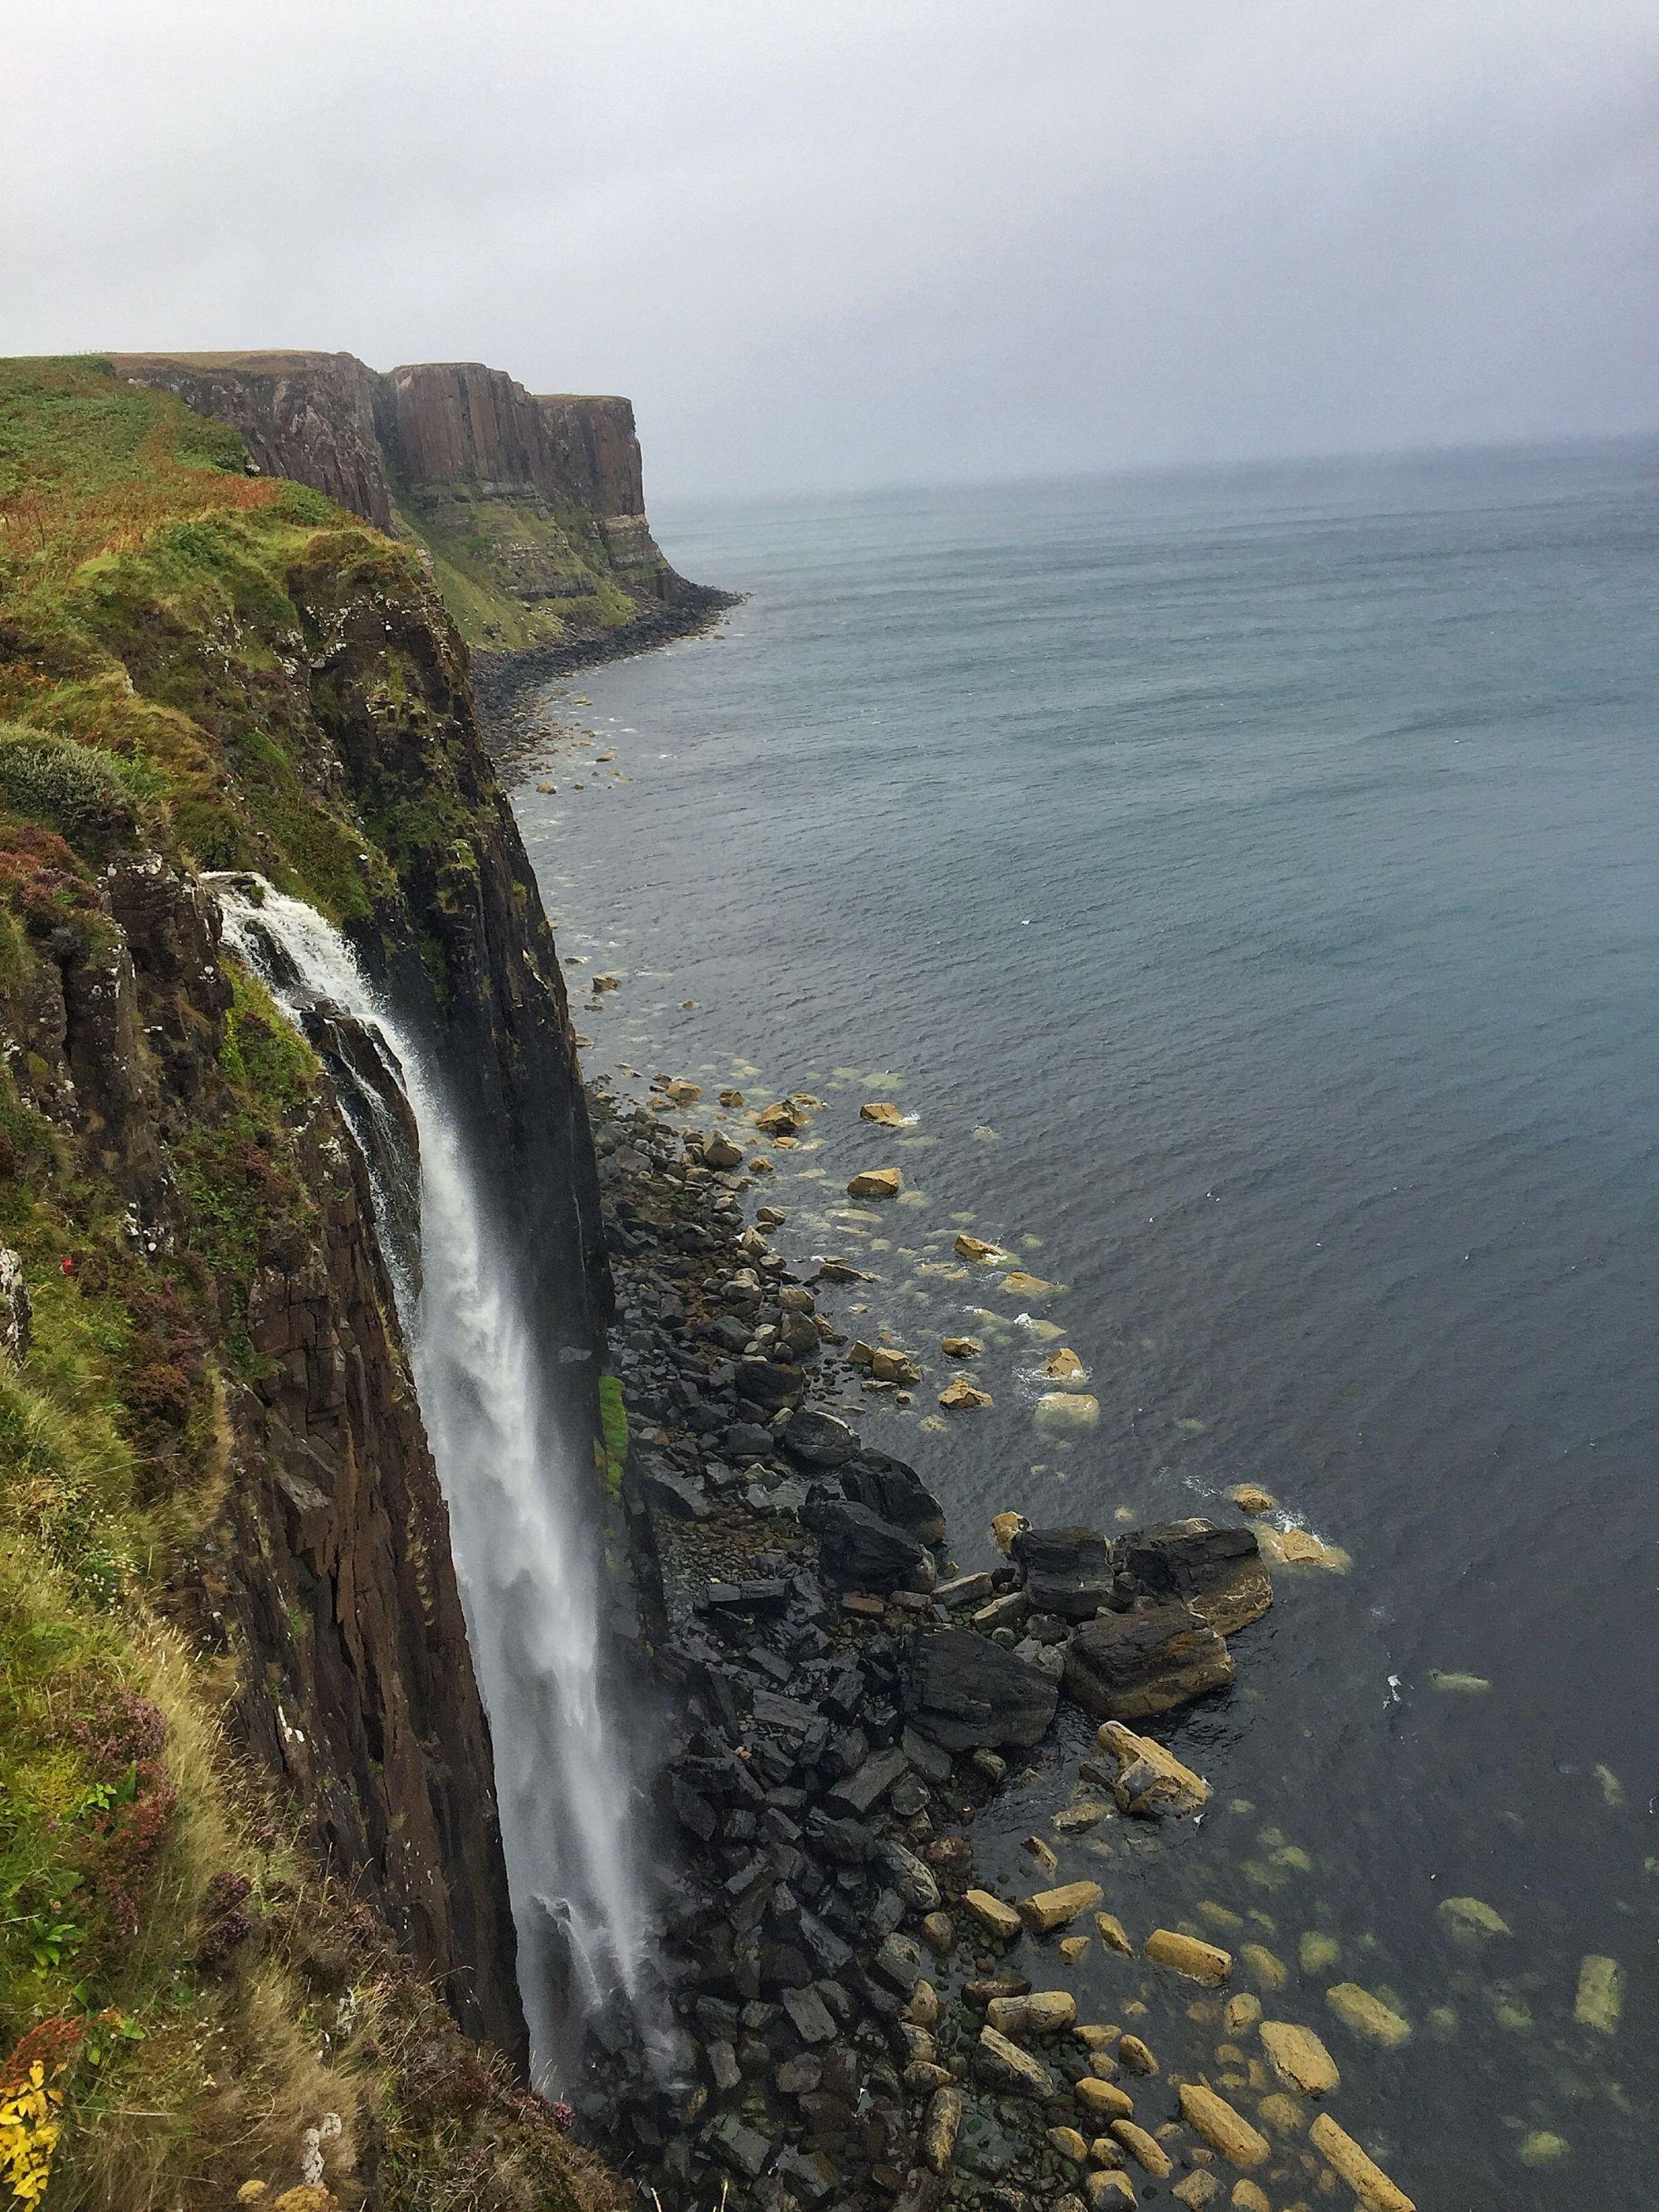 Kilt and Fall-Kilt Rock